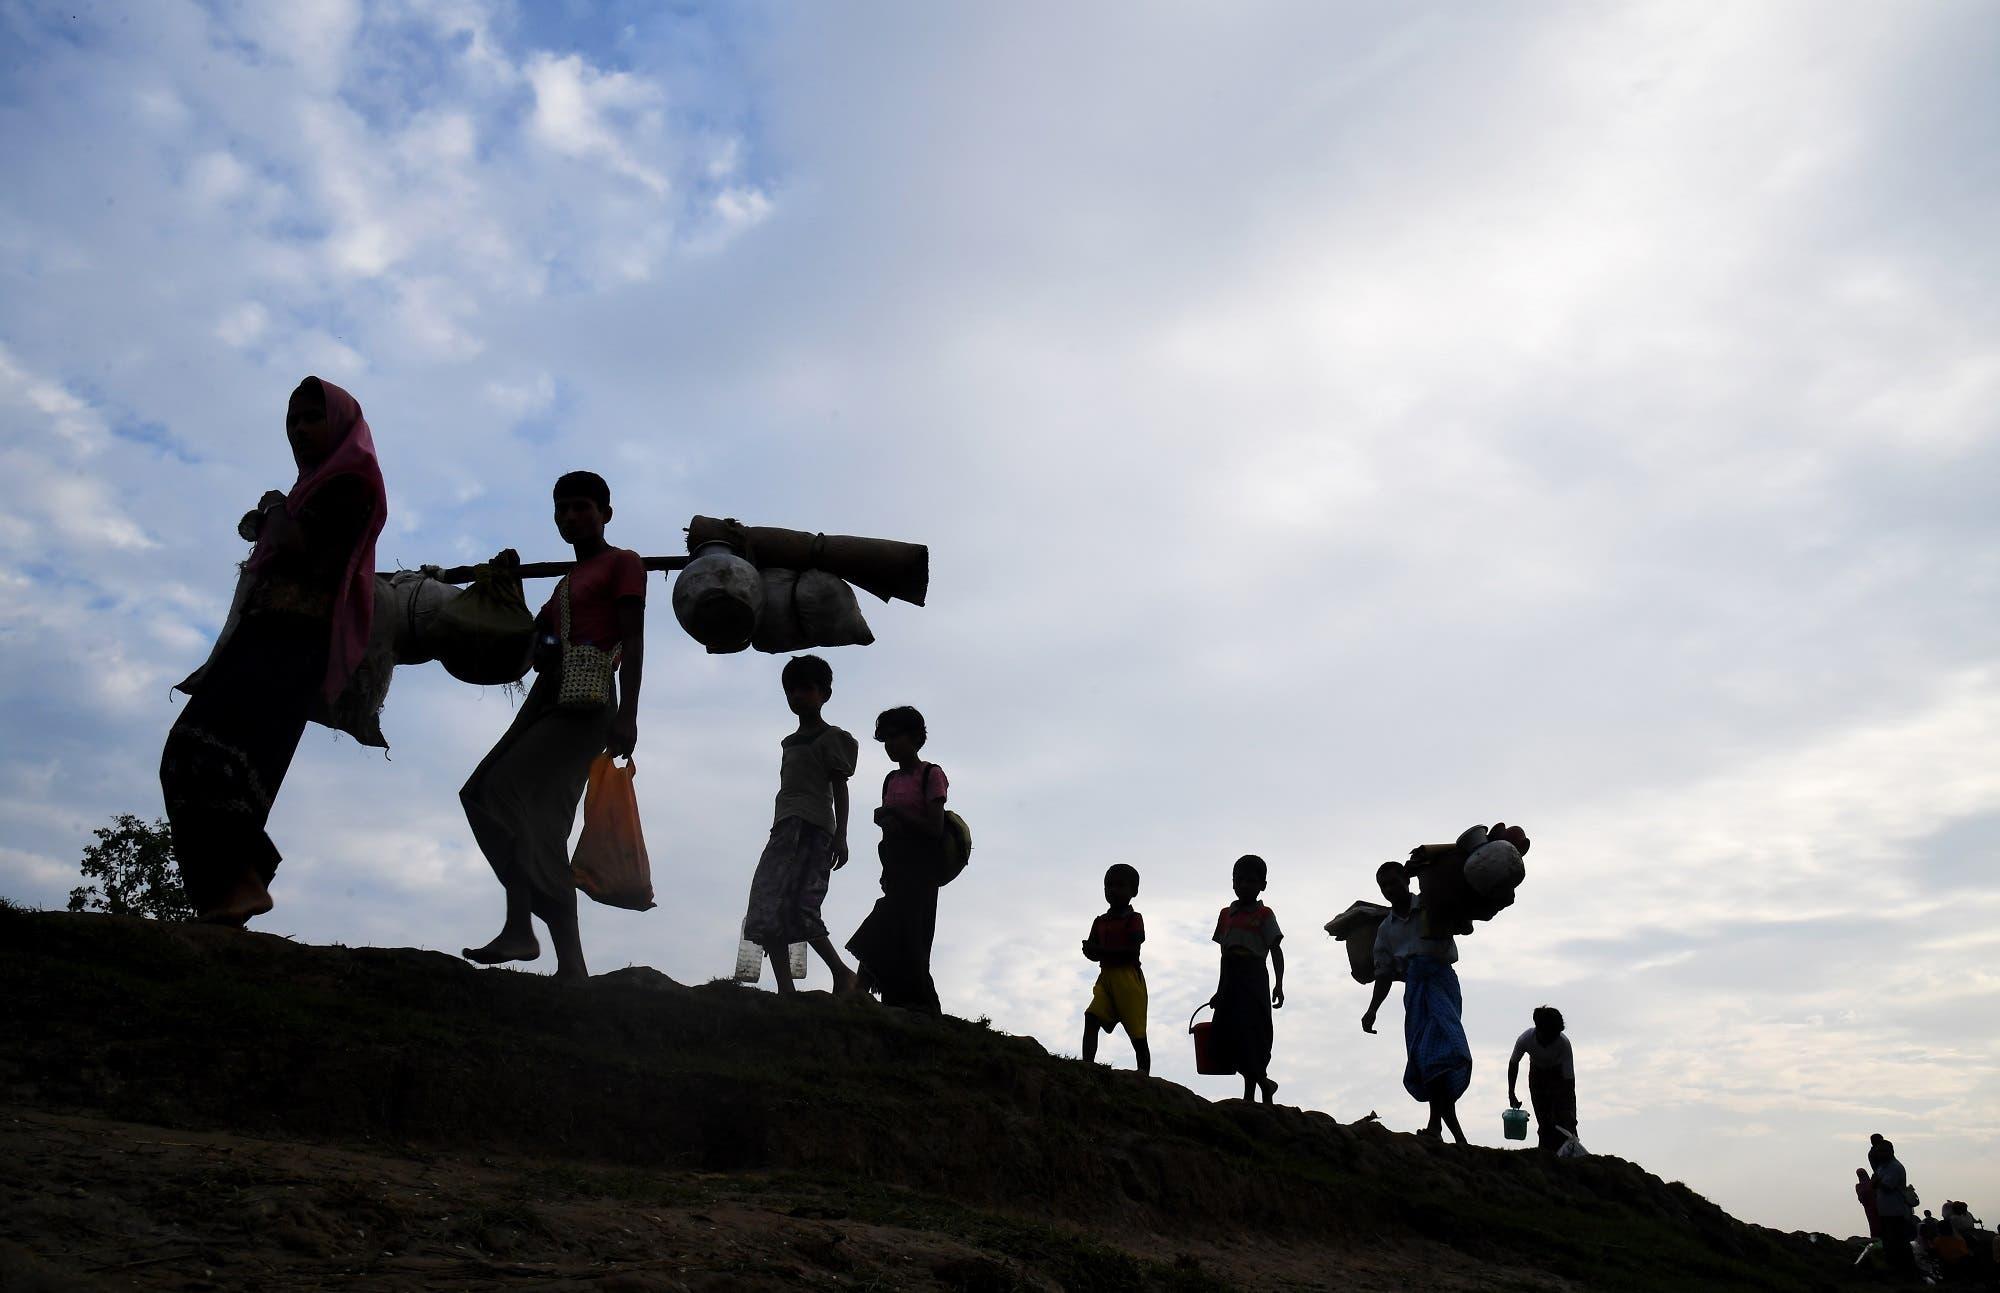 Rohingya refugees walk into Palongkhali in Bangladesh's Ukhia district on November 2, 2017. (AFP)